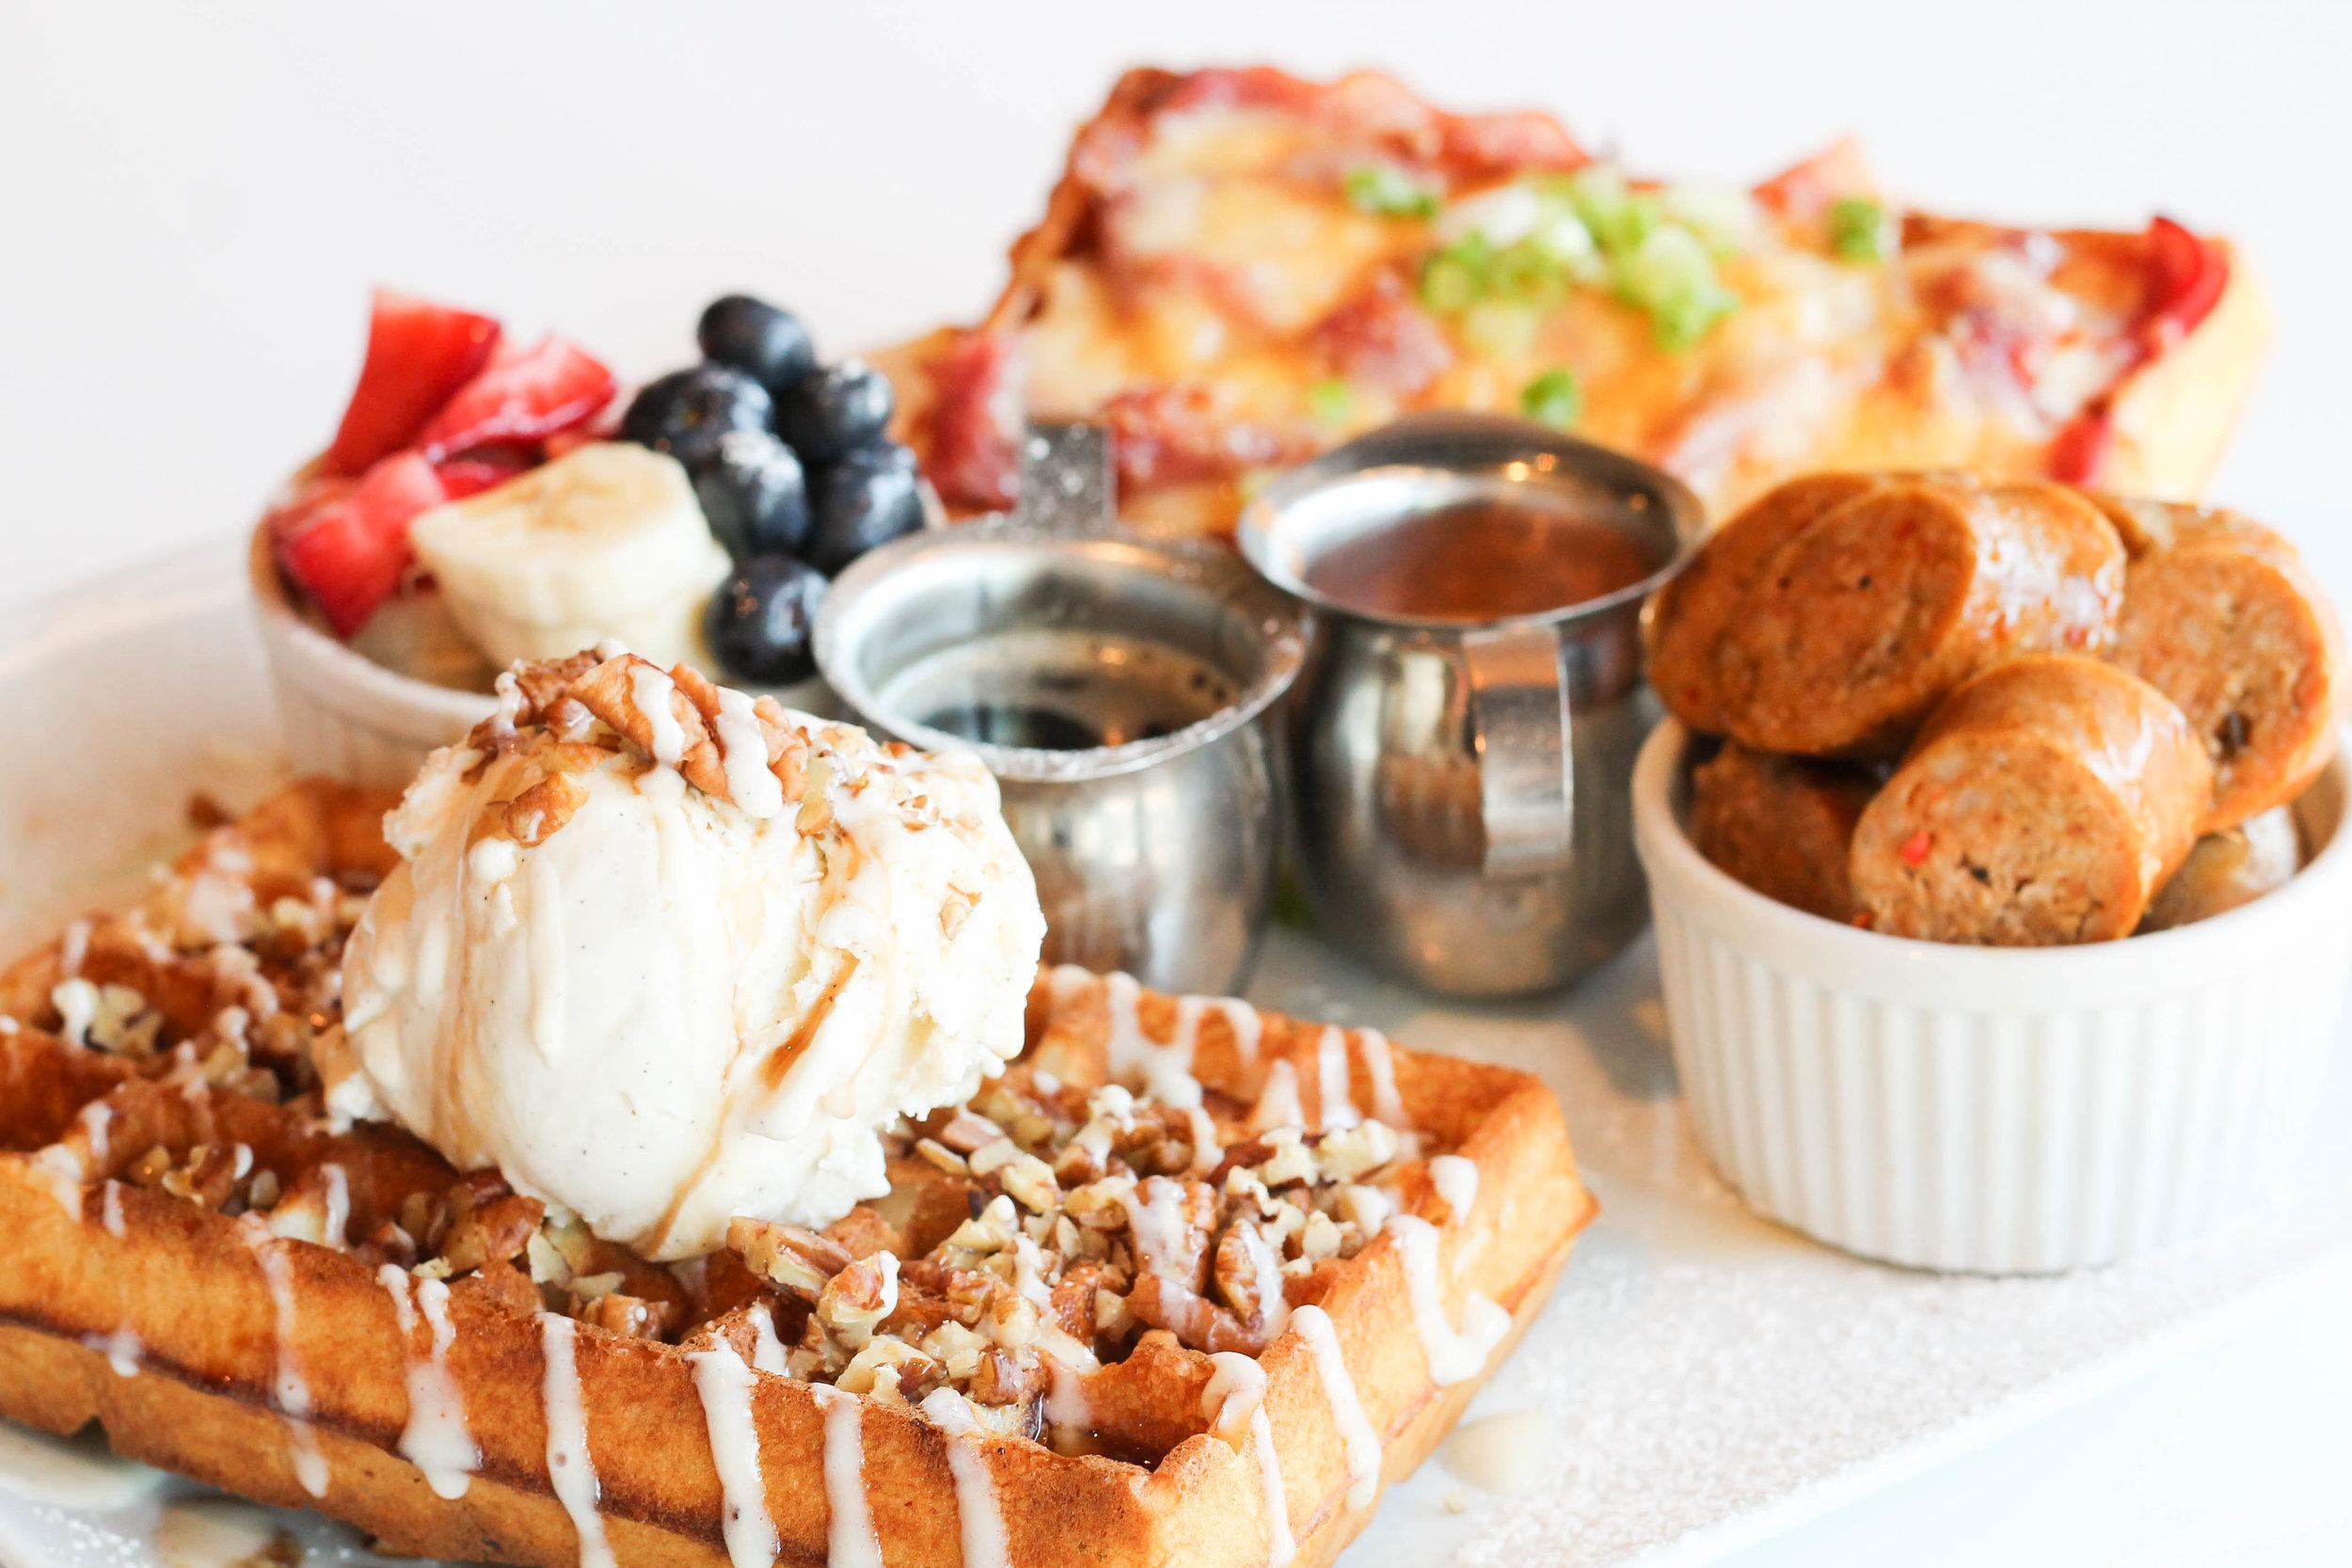 The Buttermilk Breakfast with Ham & Cinnamon Bun Waffles